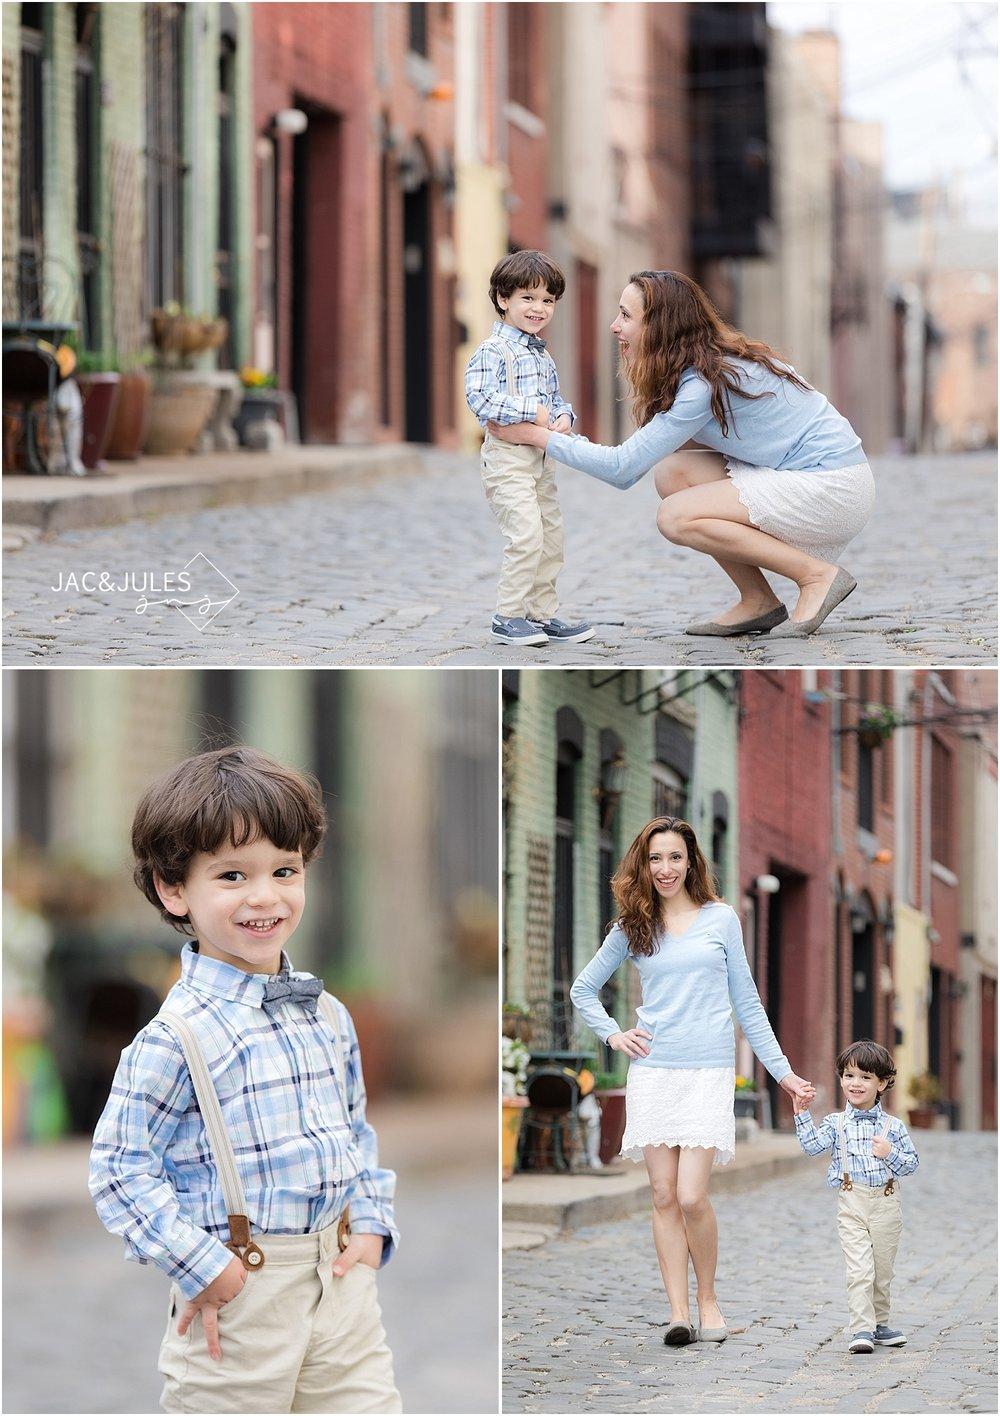 jacnjules photographs mother and son on cobblestone street in Hoboken NJ